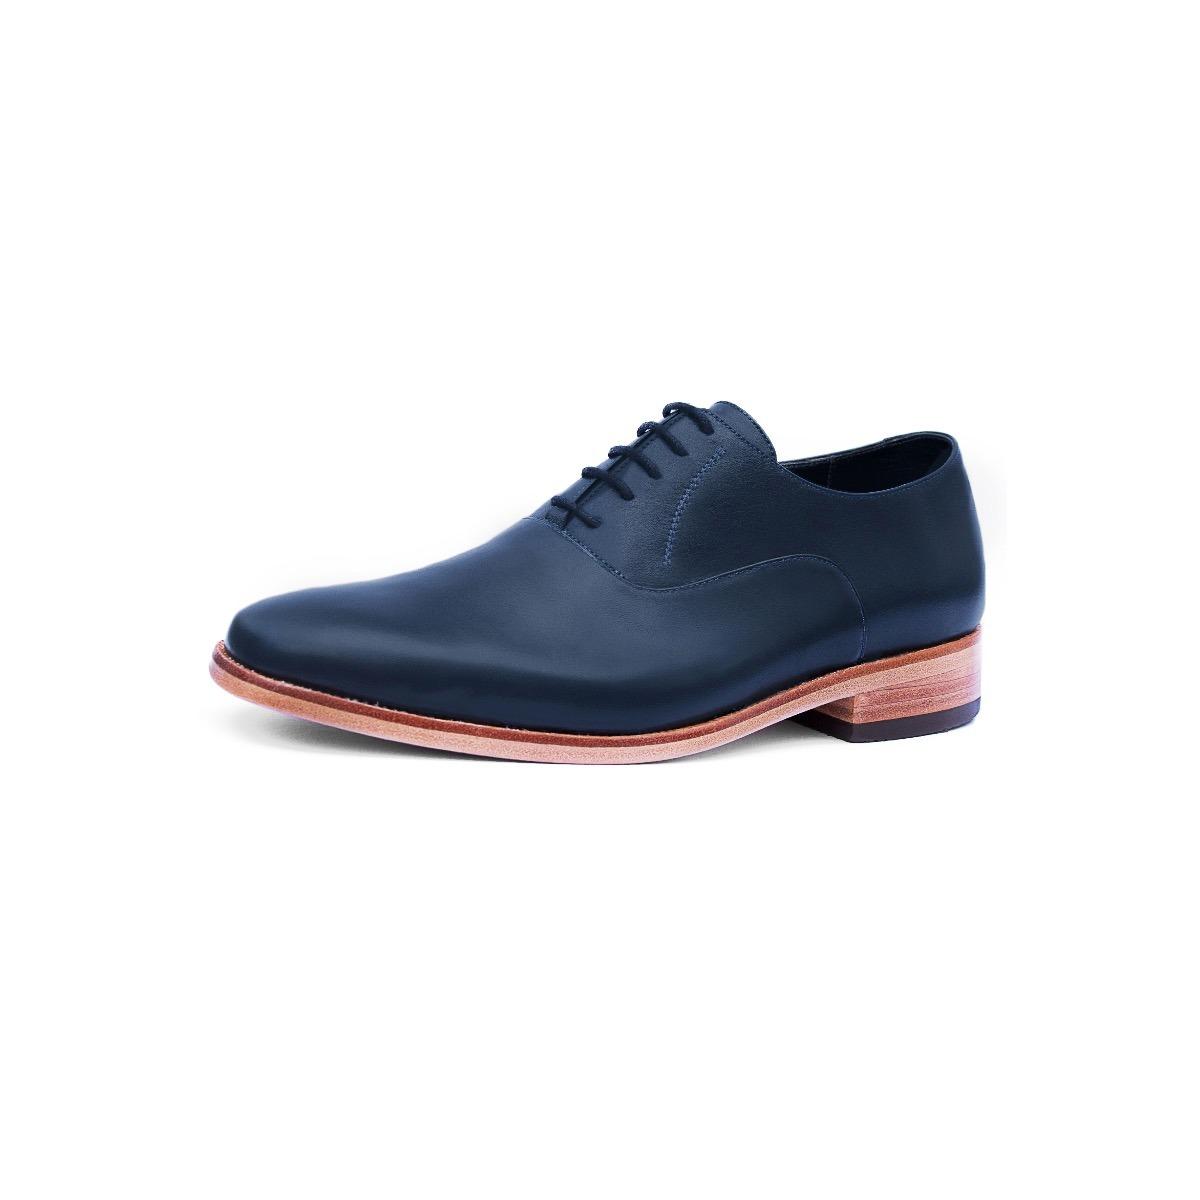 fd7a65e760da9 Zapato Hombre Plano Cuero Azul Diseño Grey Suela Cuero -   85.000 en ...